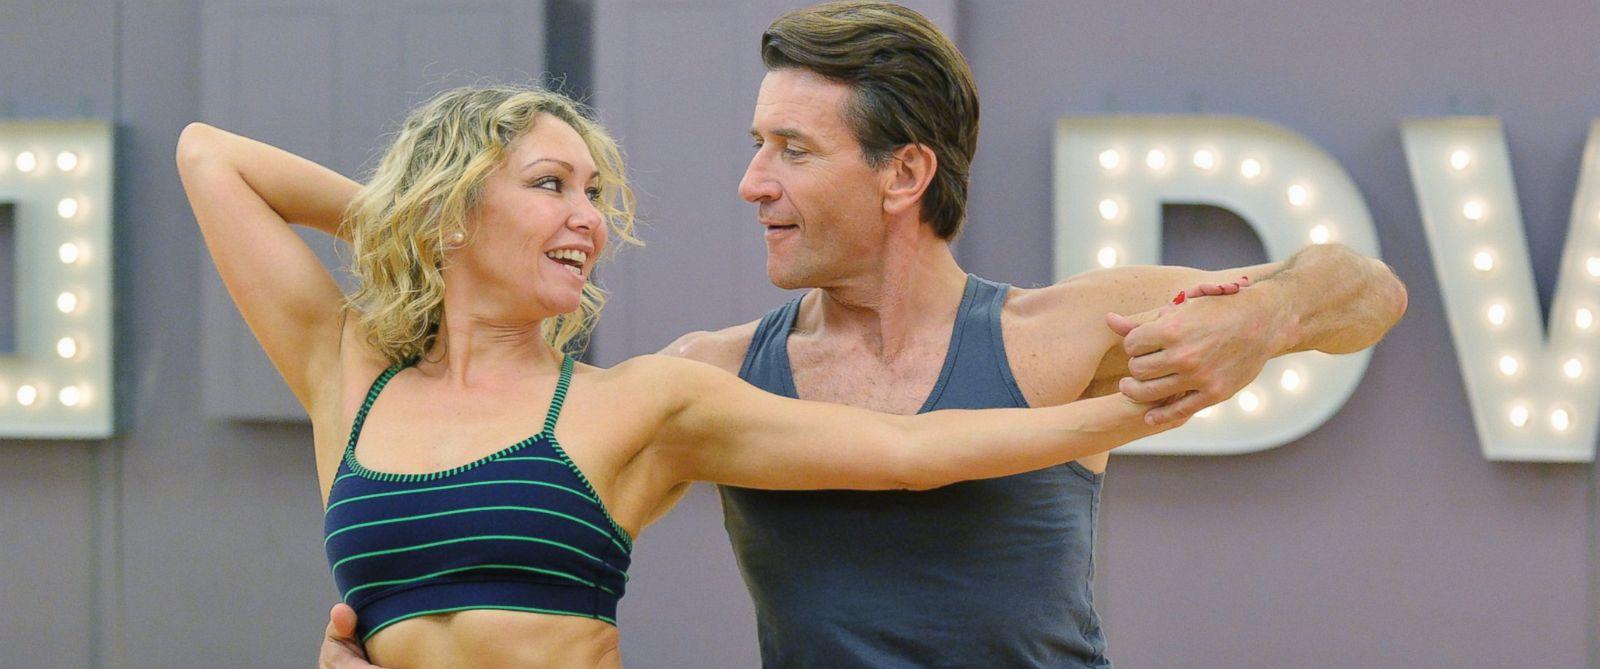 'Dancing With The Stars' Contestant Robert Herjavec Talks